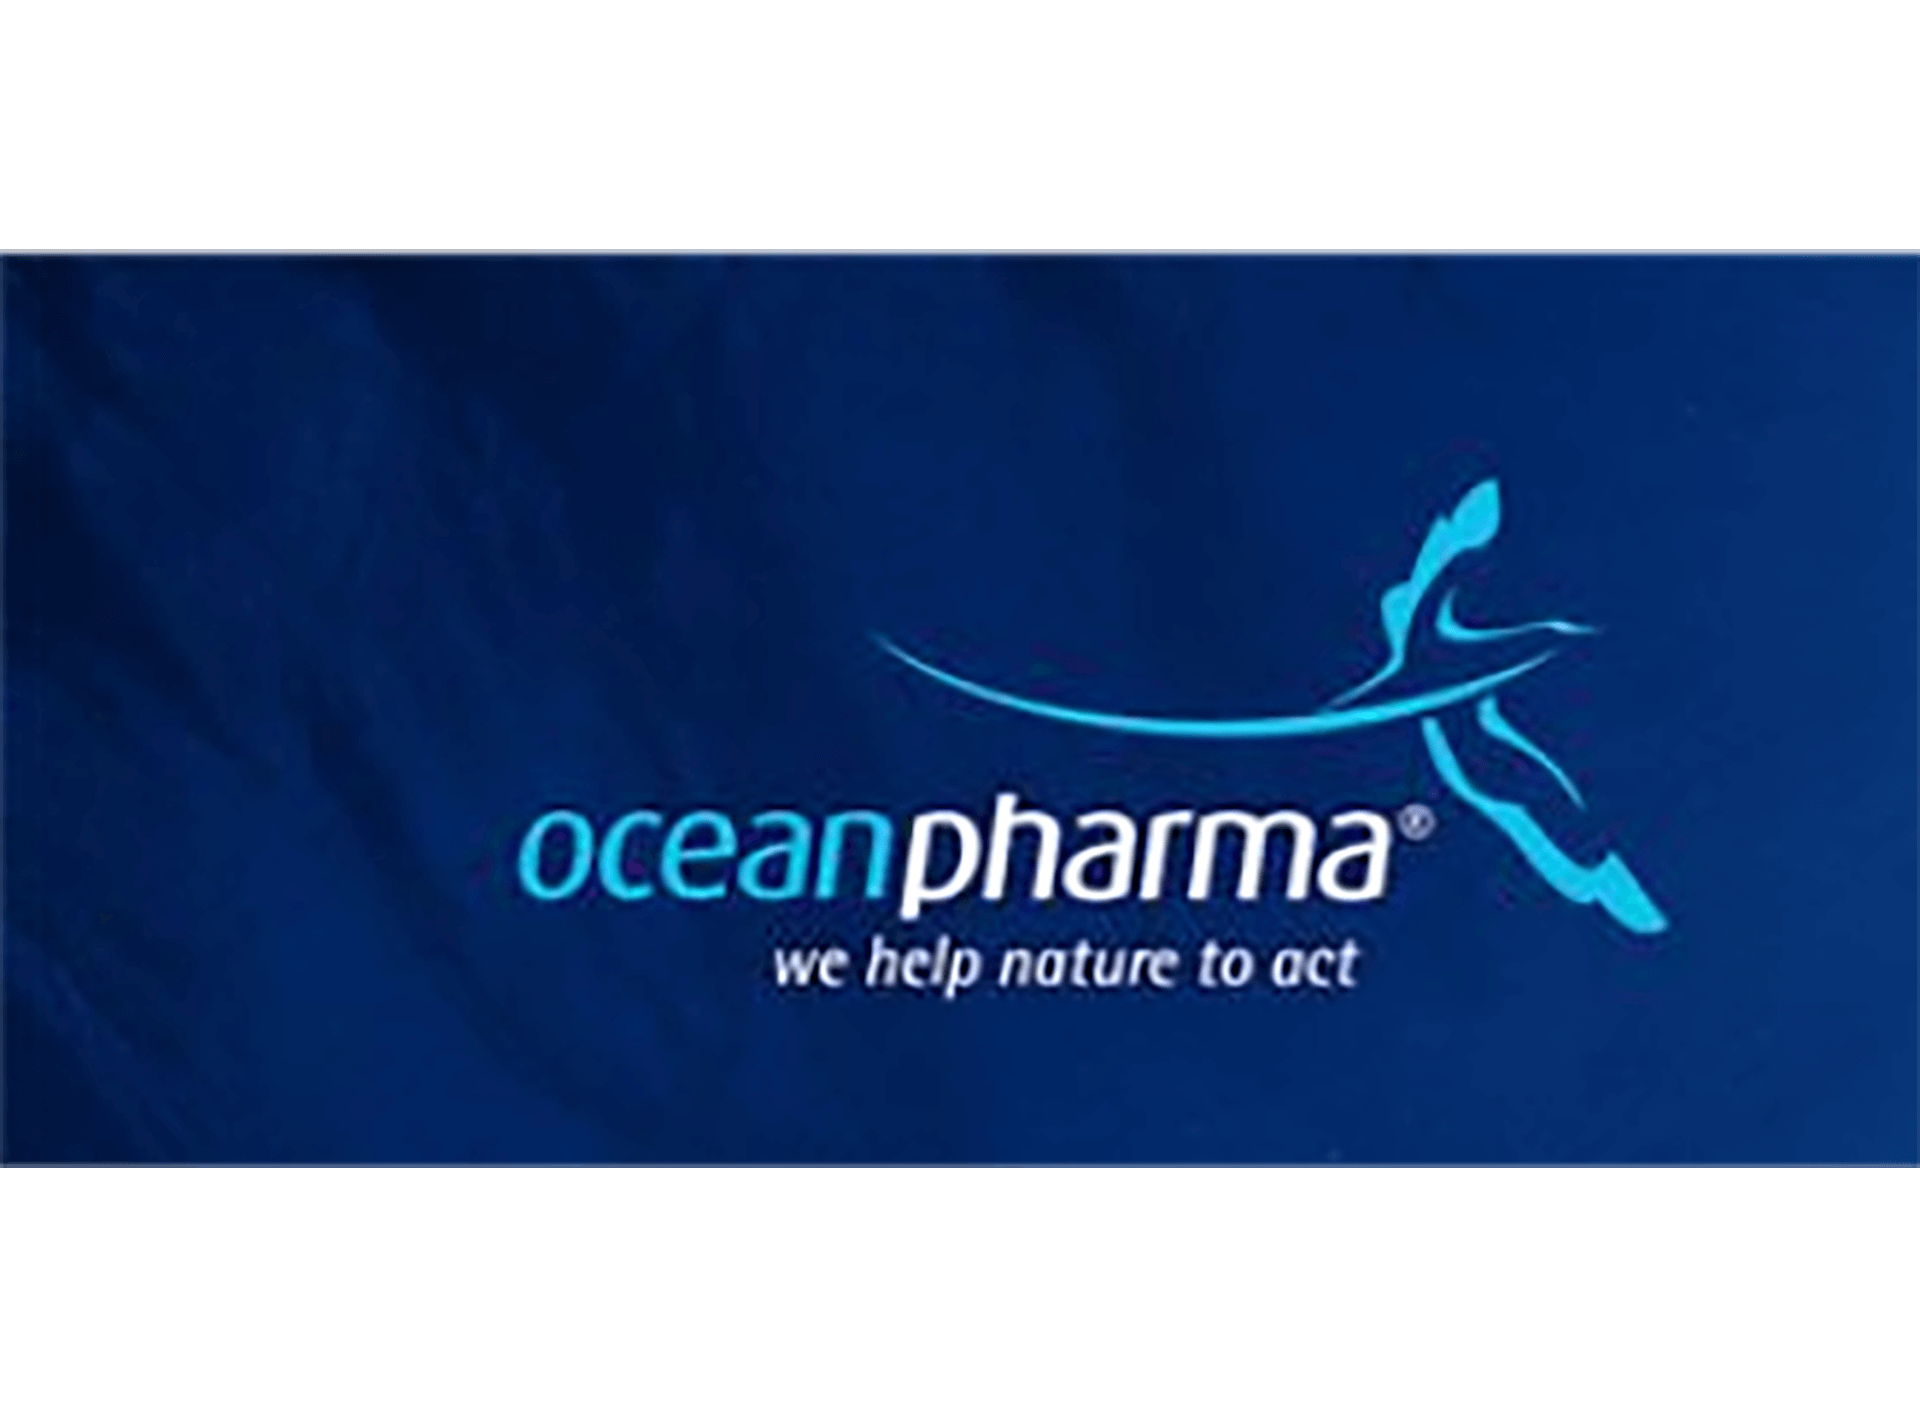 Oceanpharma